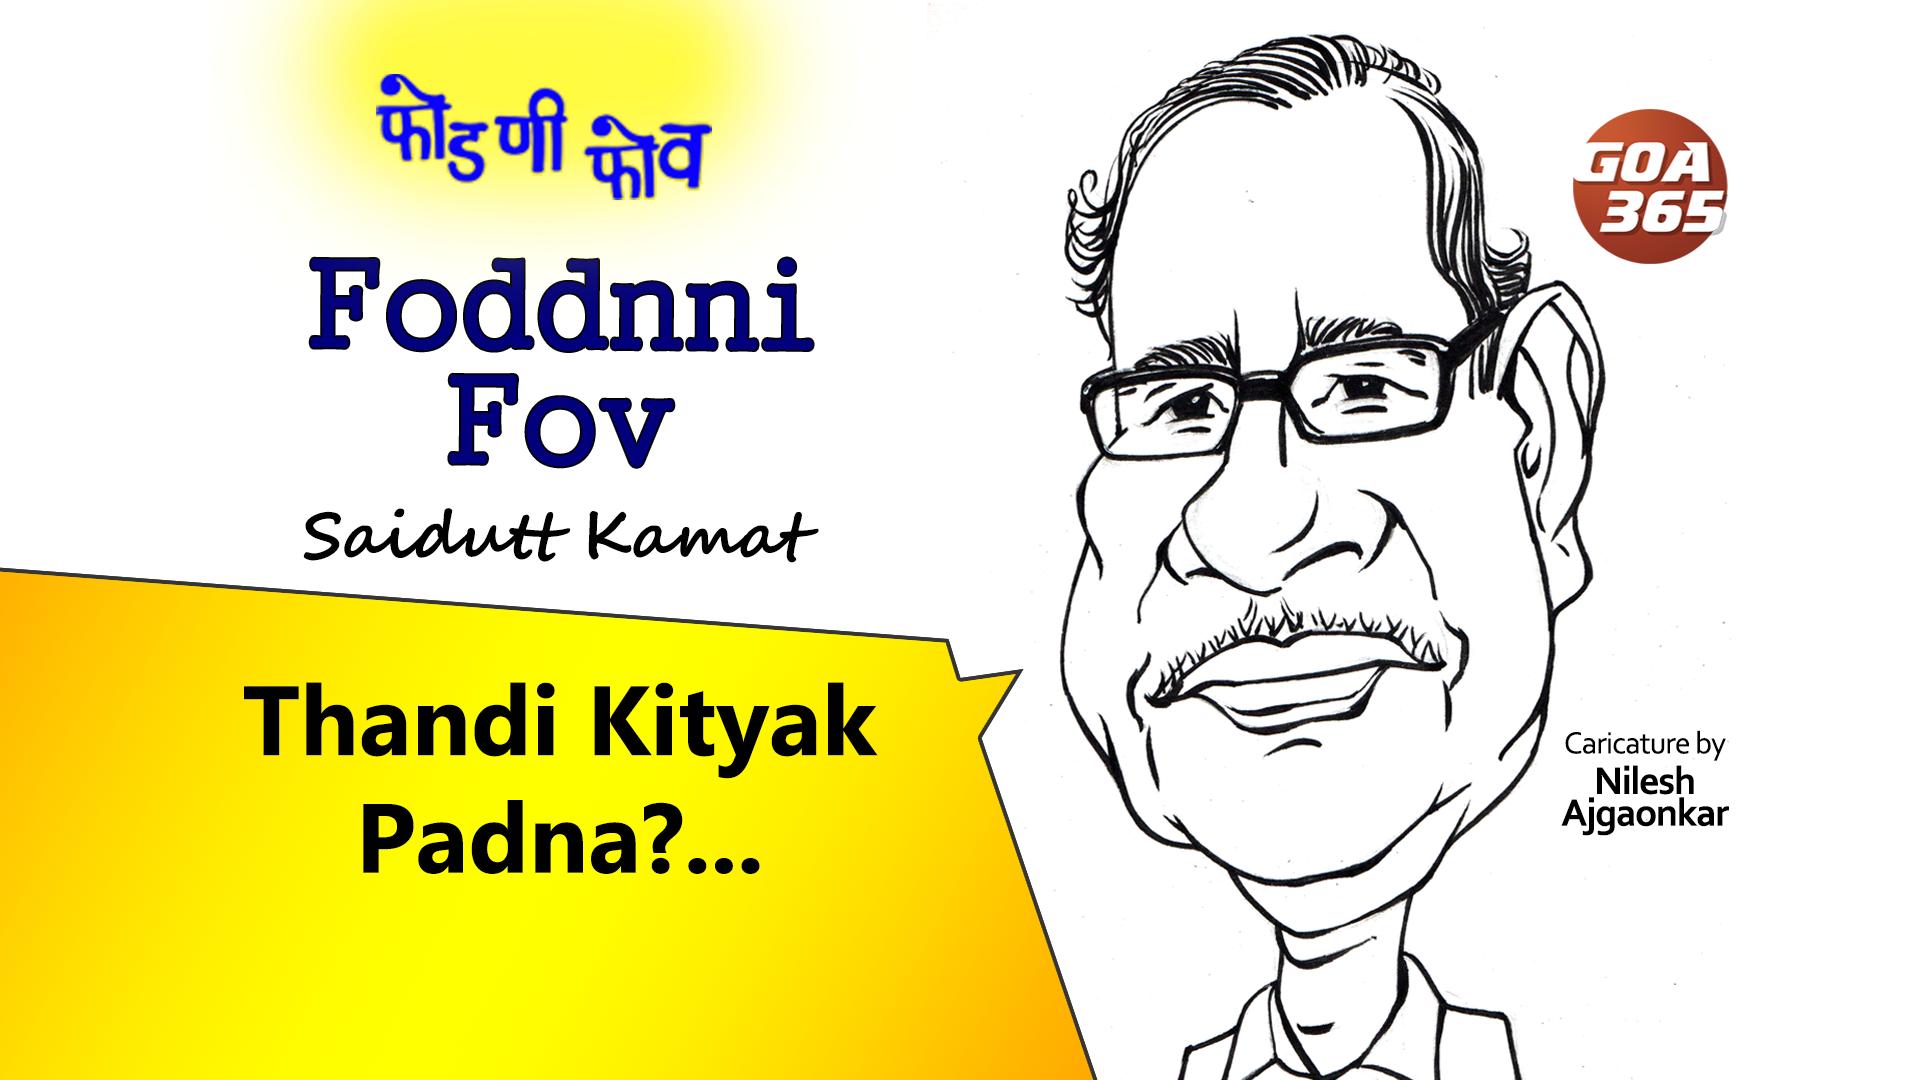 FODDNNI FOV : Thandi Kityak Padna ?